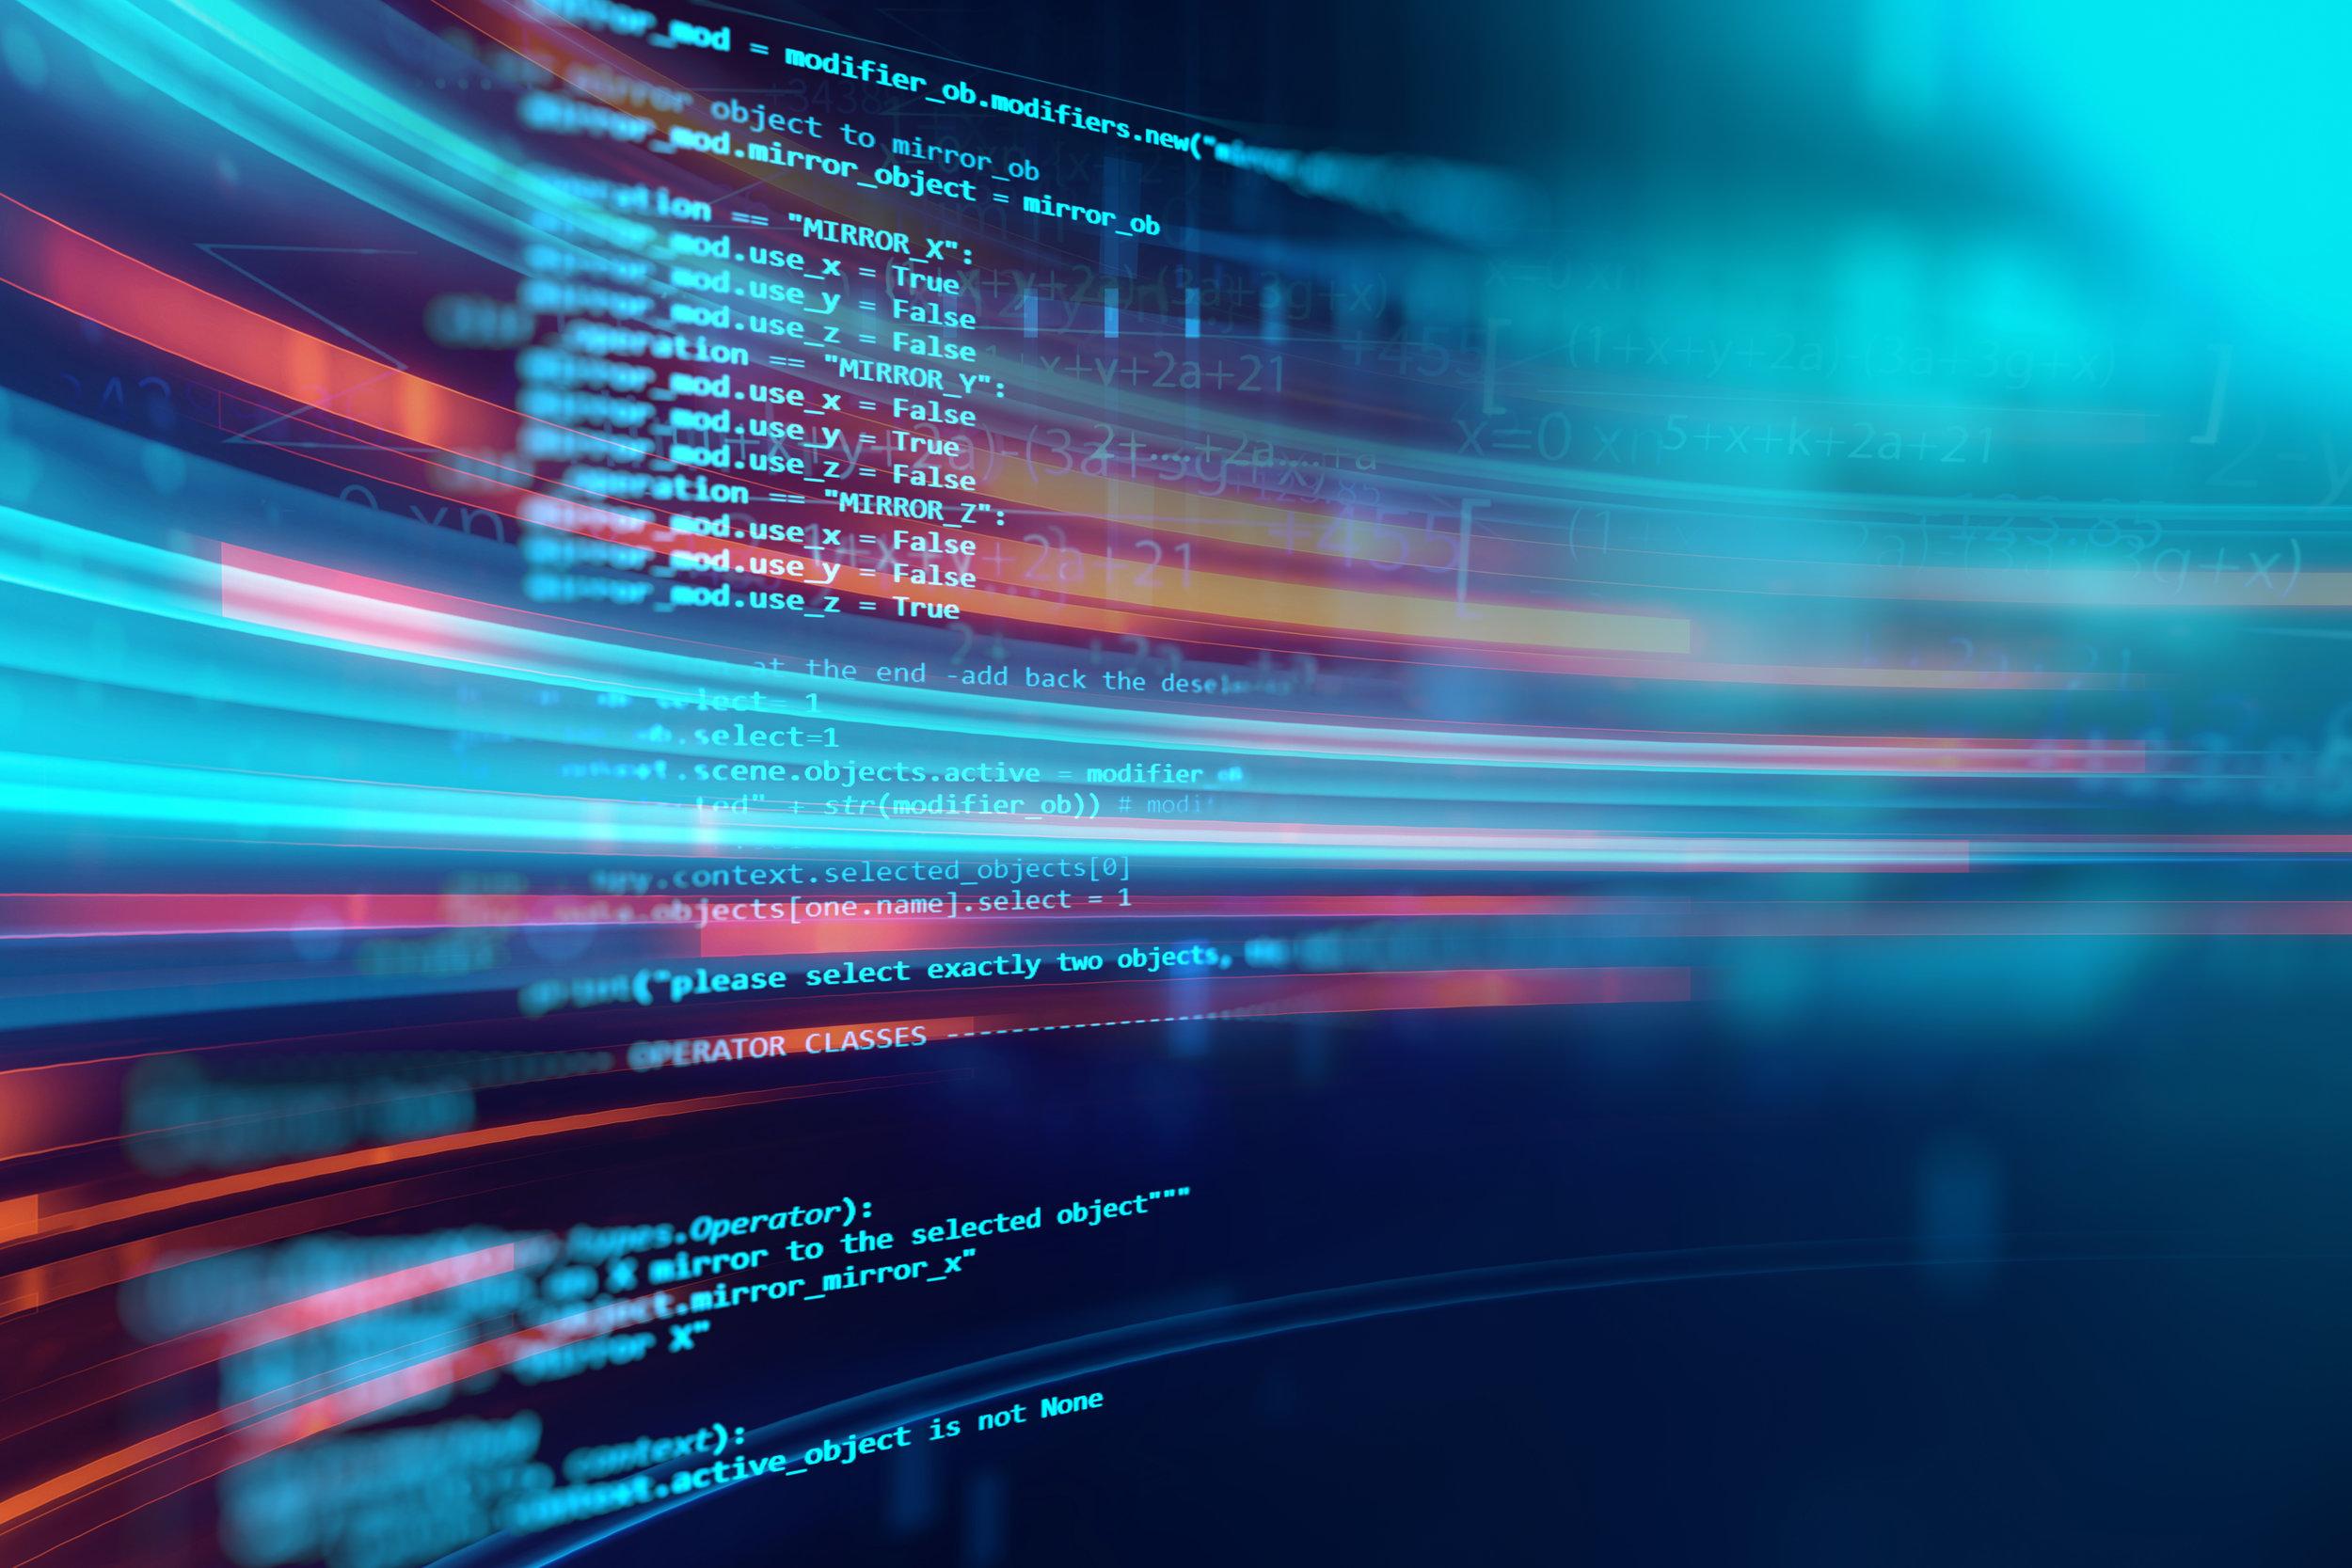 FEATURED: Archimydes - Technology Focus: Development Tools & Platforms, Serverless Compute